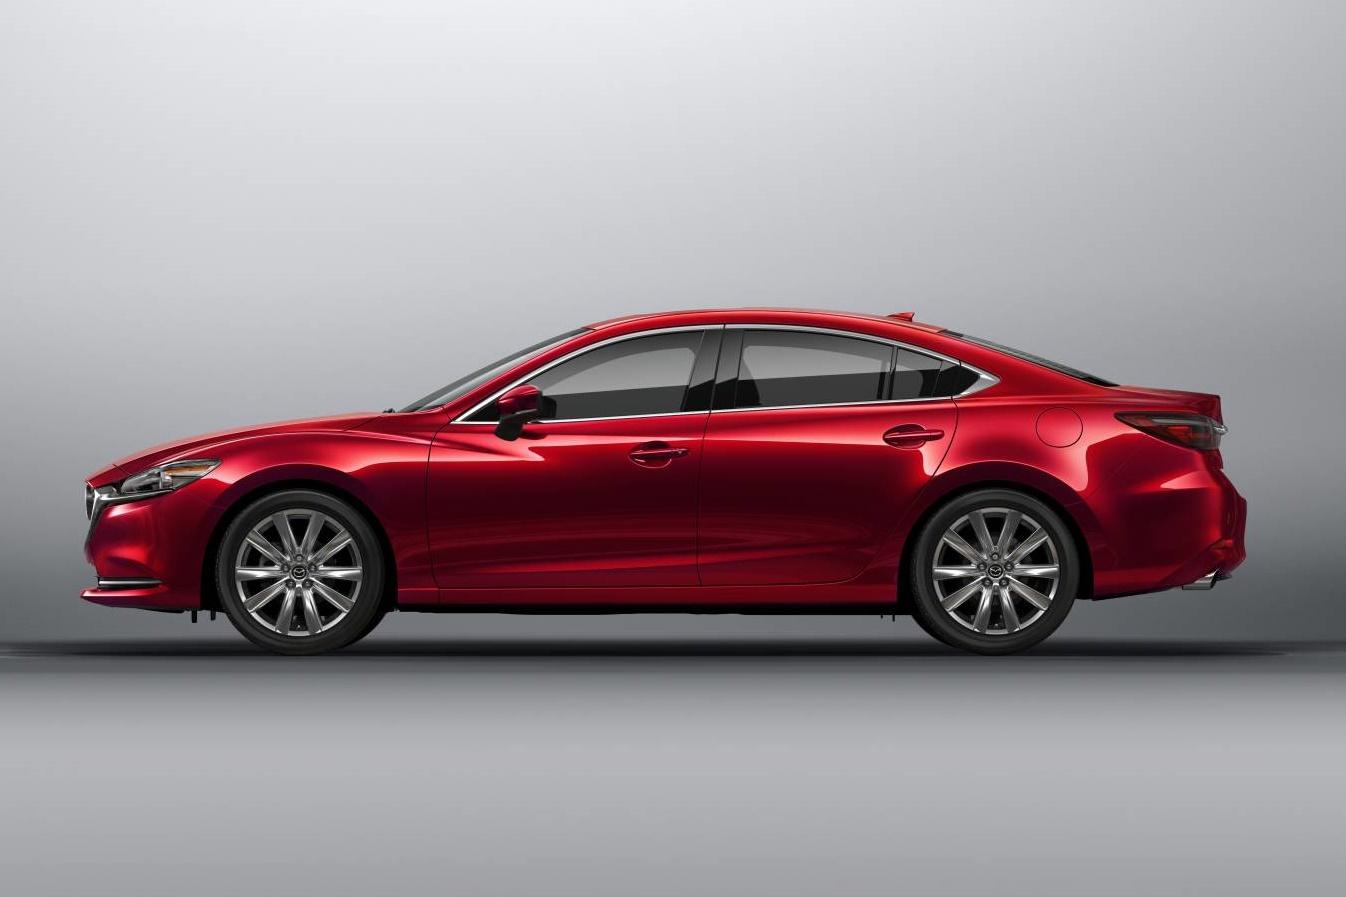 Kekurangan Mazda 6 Harga